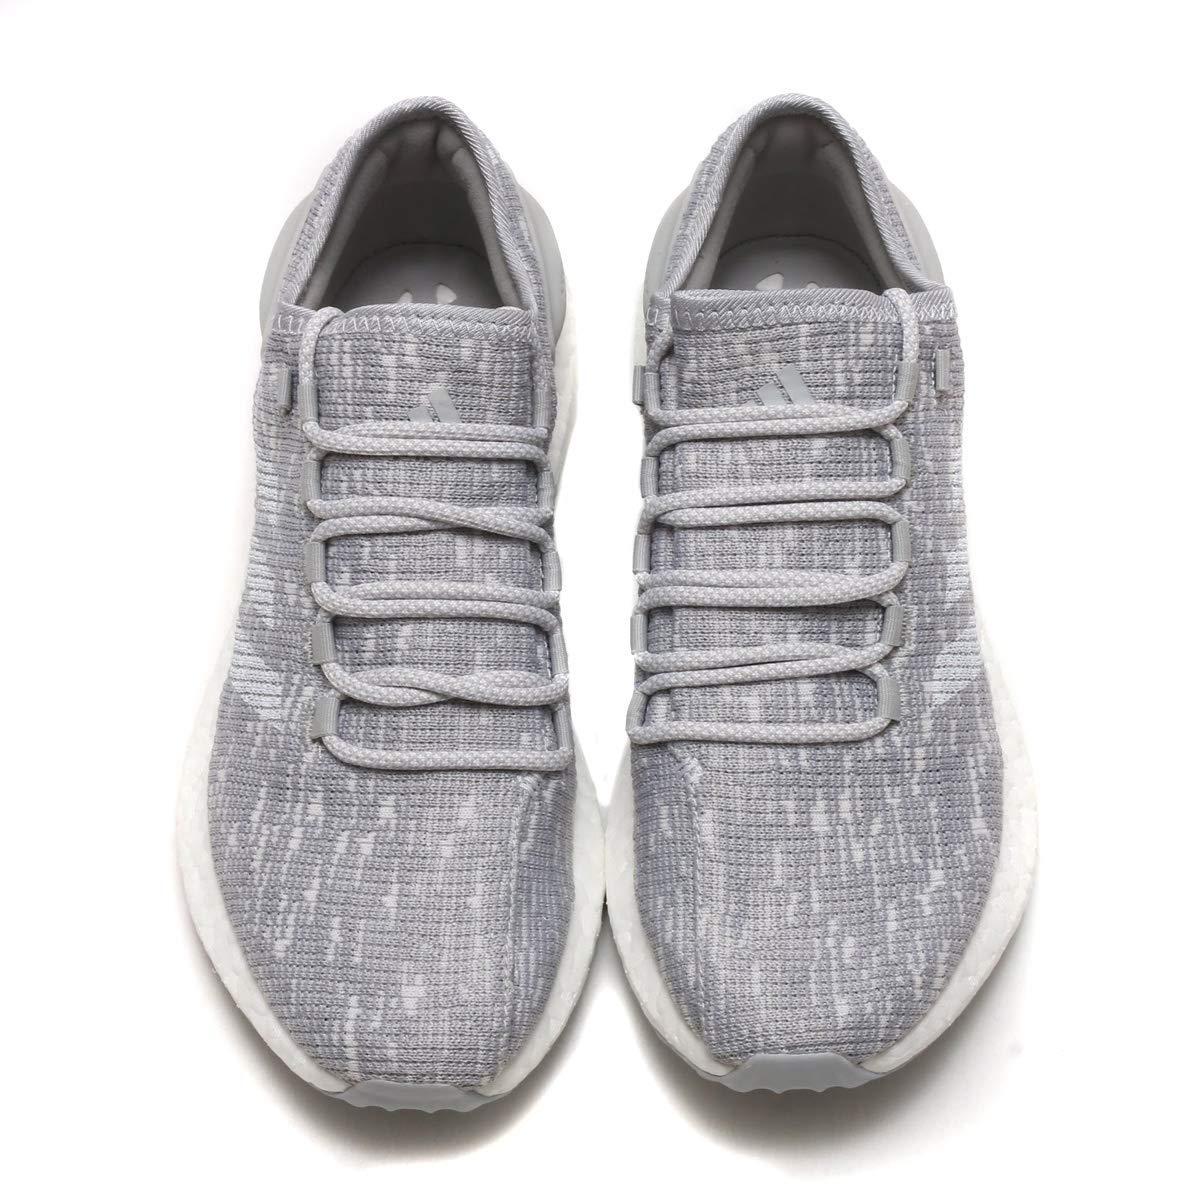 f85c4e4fb adidas Performance Men s Pureboost LTD Running Shoes BB6305